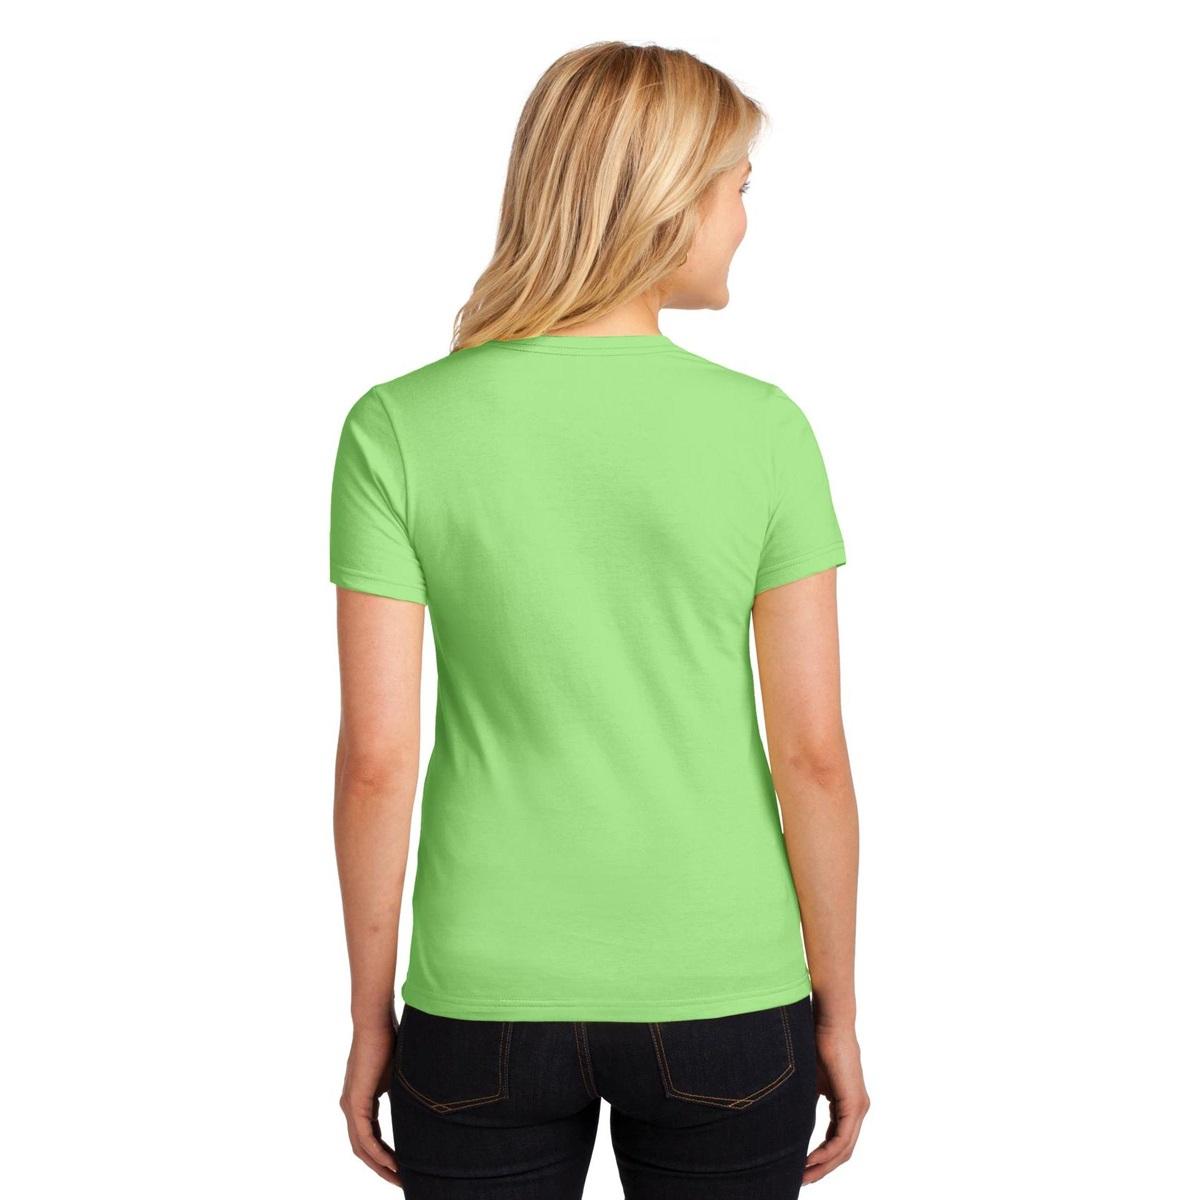 Anvil 880 ladies 100 ring spun cotton t shirt key lime for 100 ringspun cotton t shirt wholesale